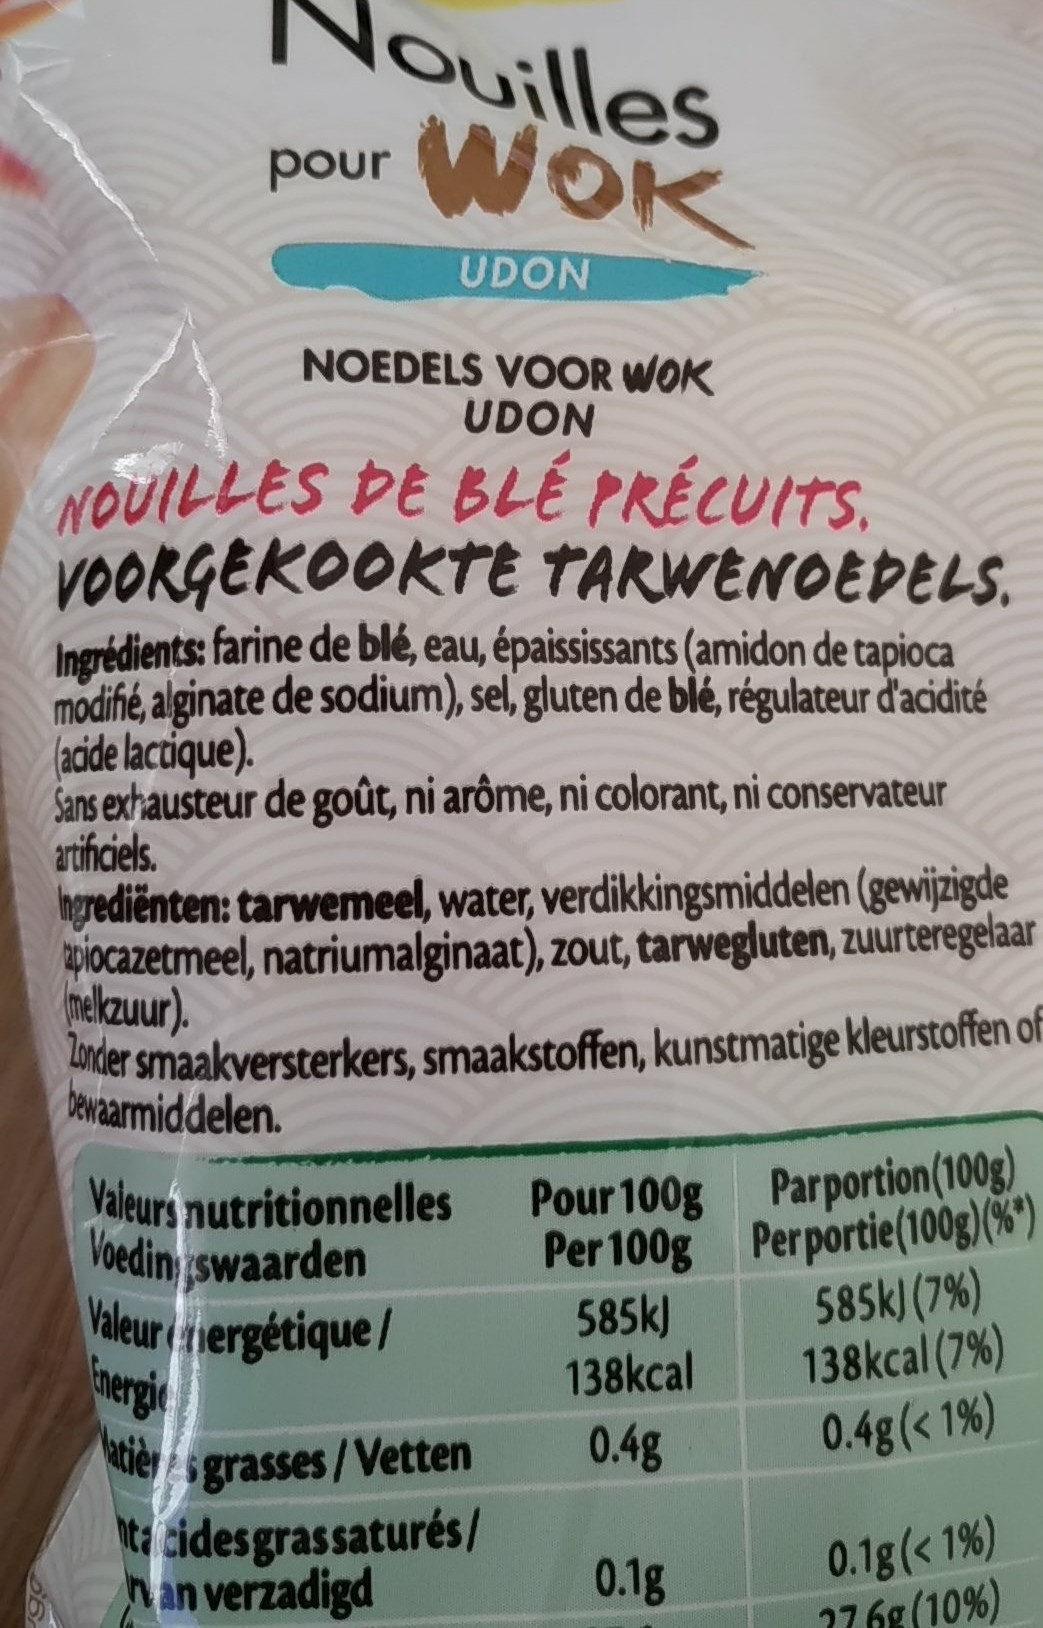 nouilles pour wok - Ingrediënten